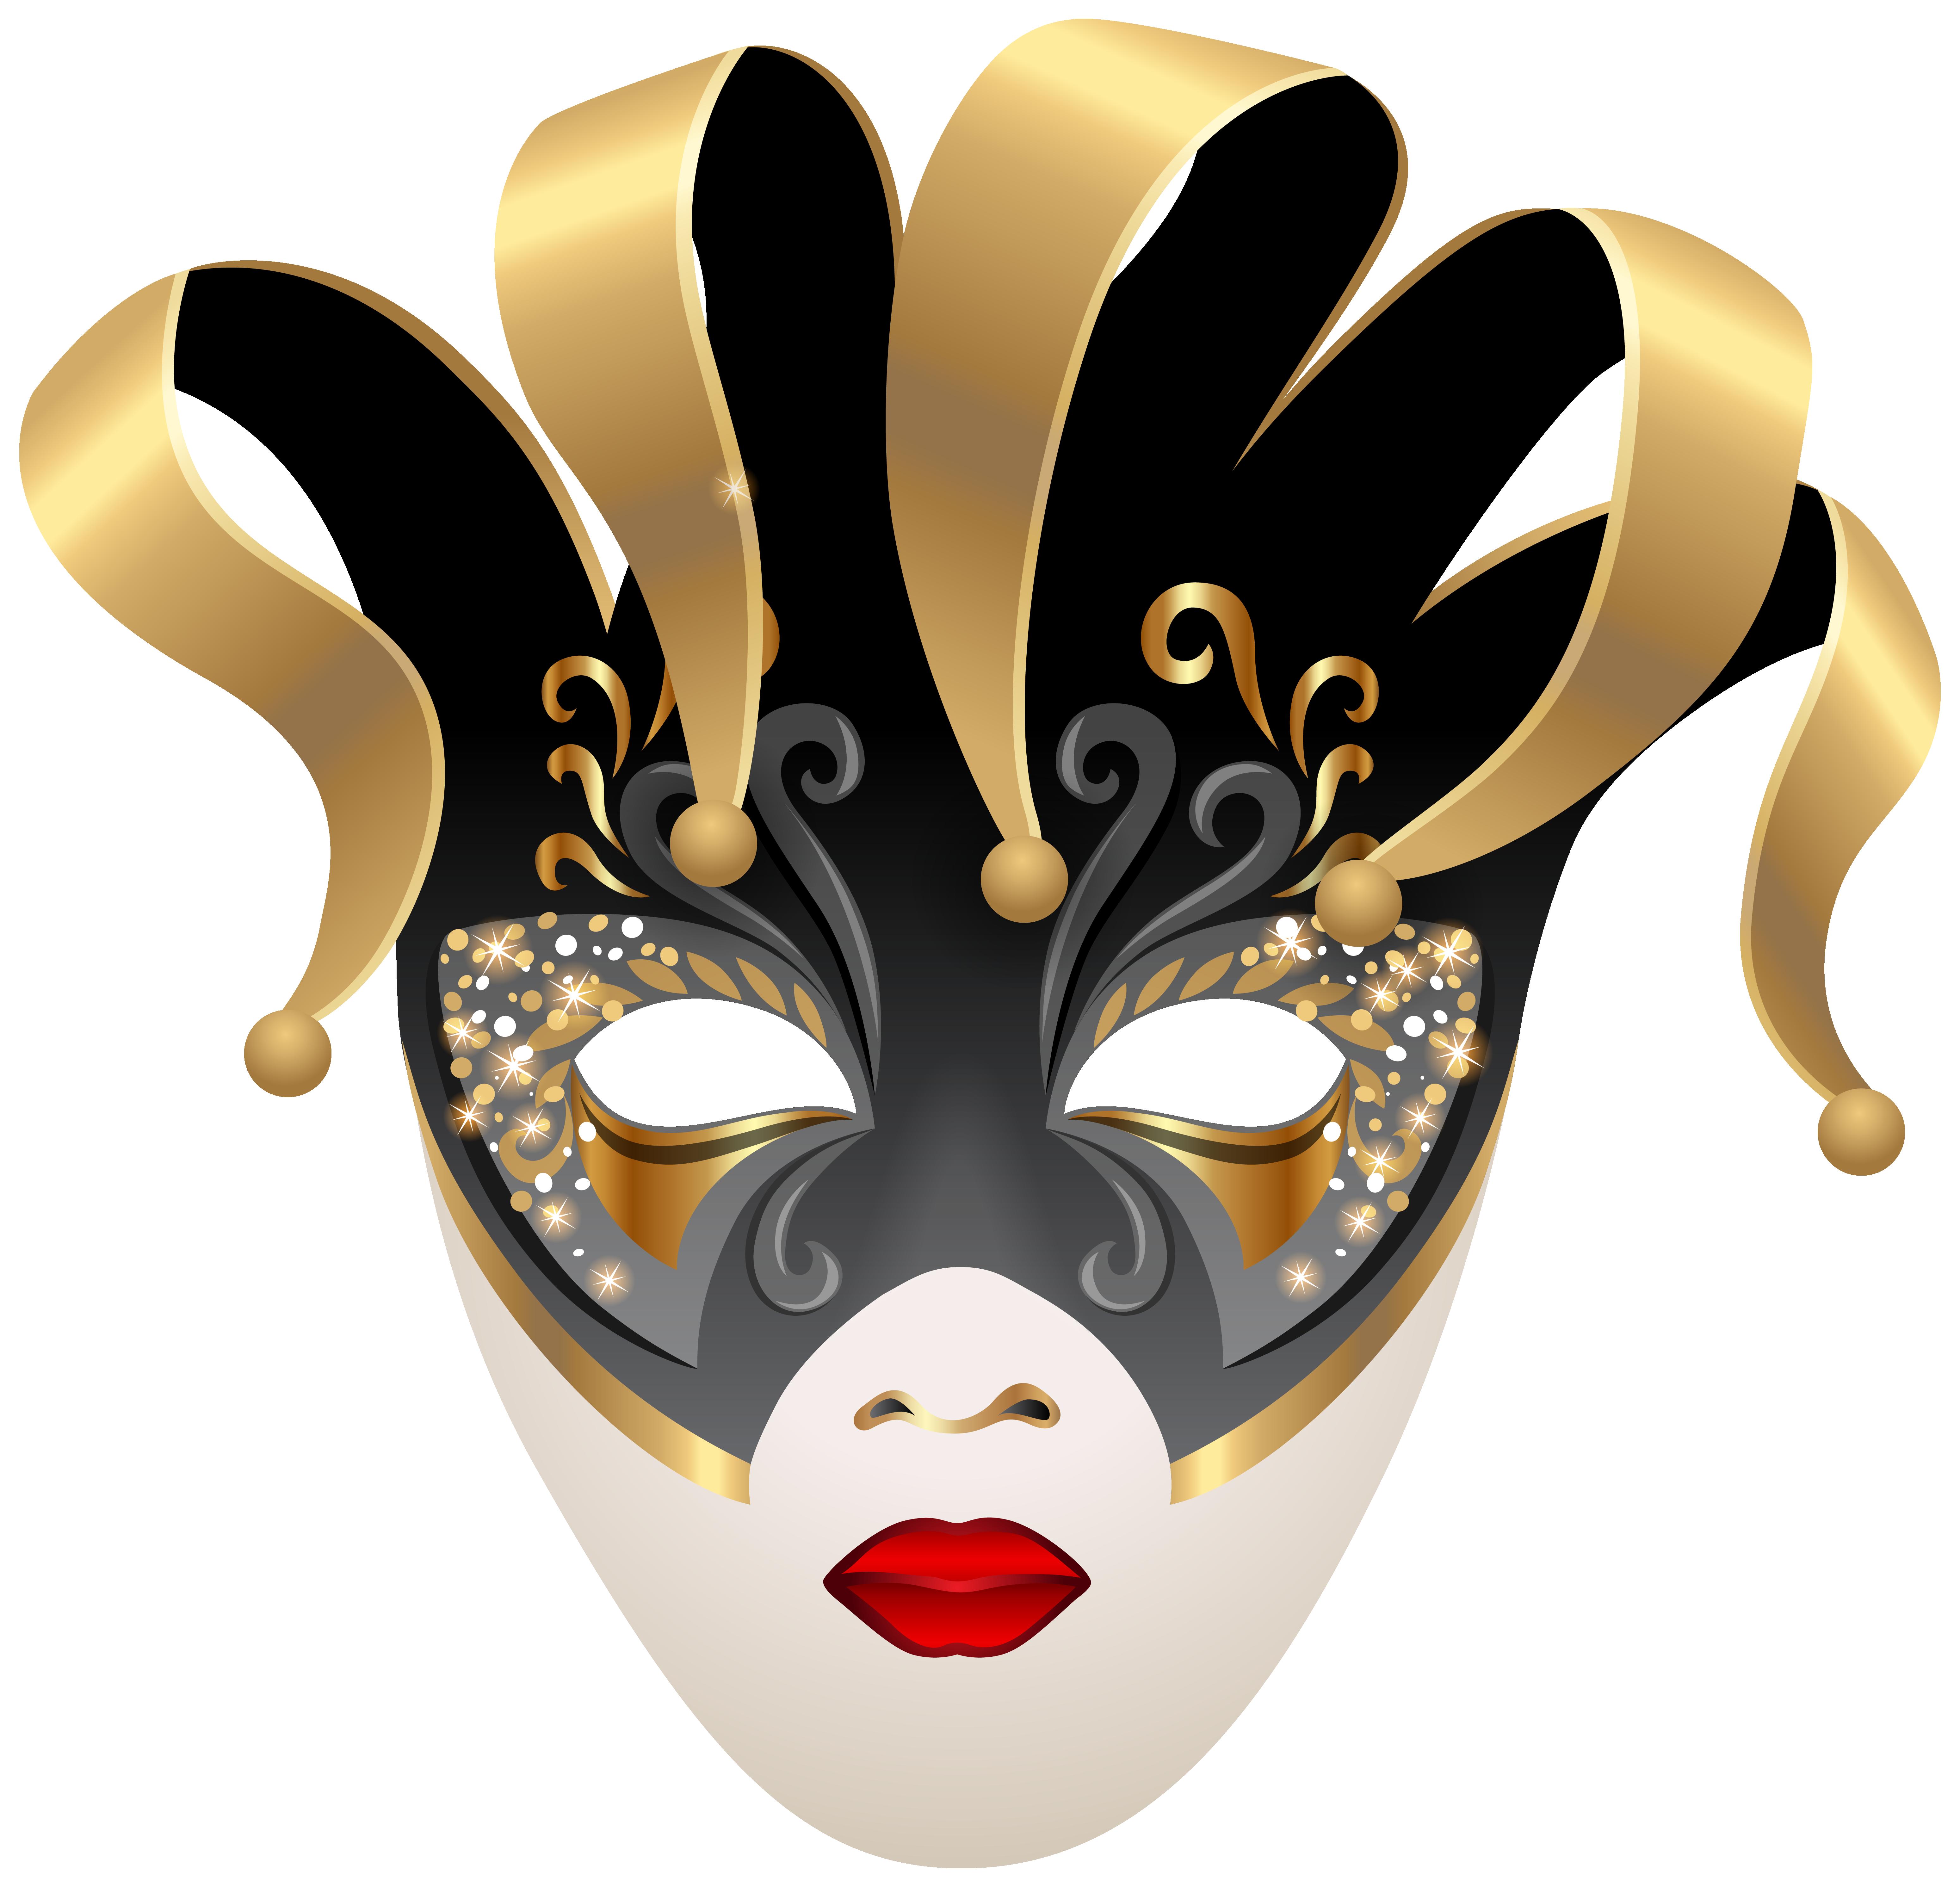 Carneval clipart carnival mask Art Mask Clip Image Yopriceville